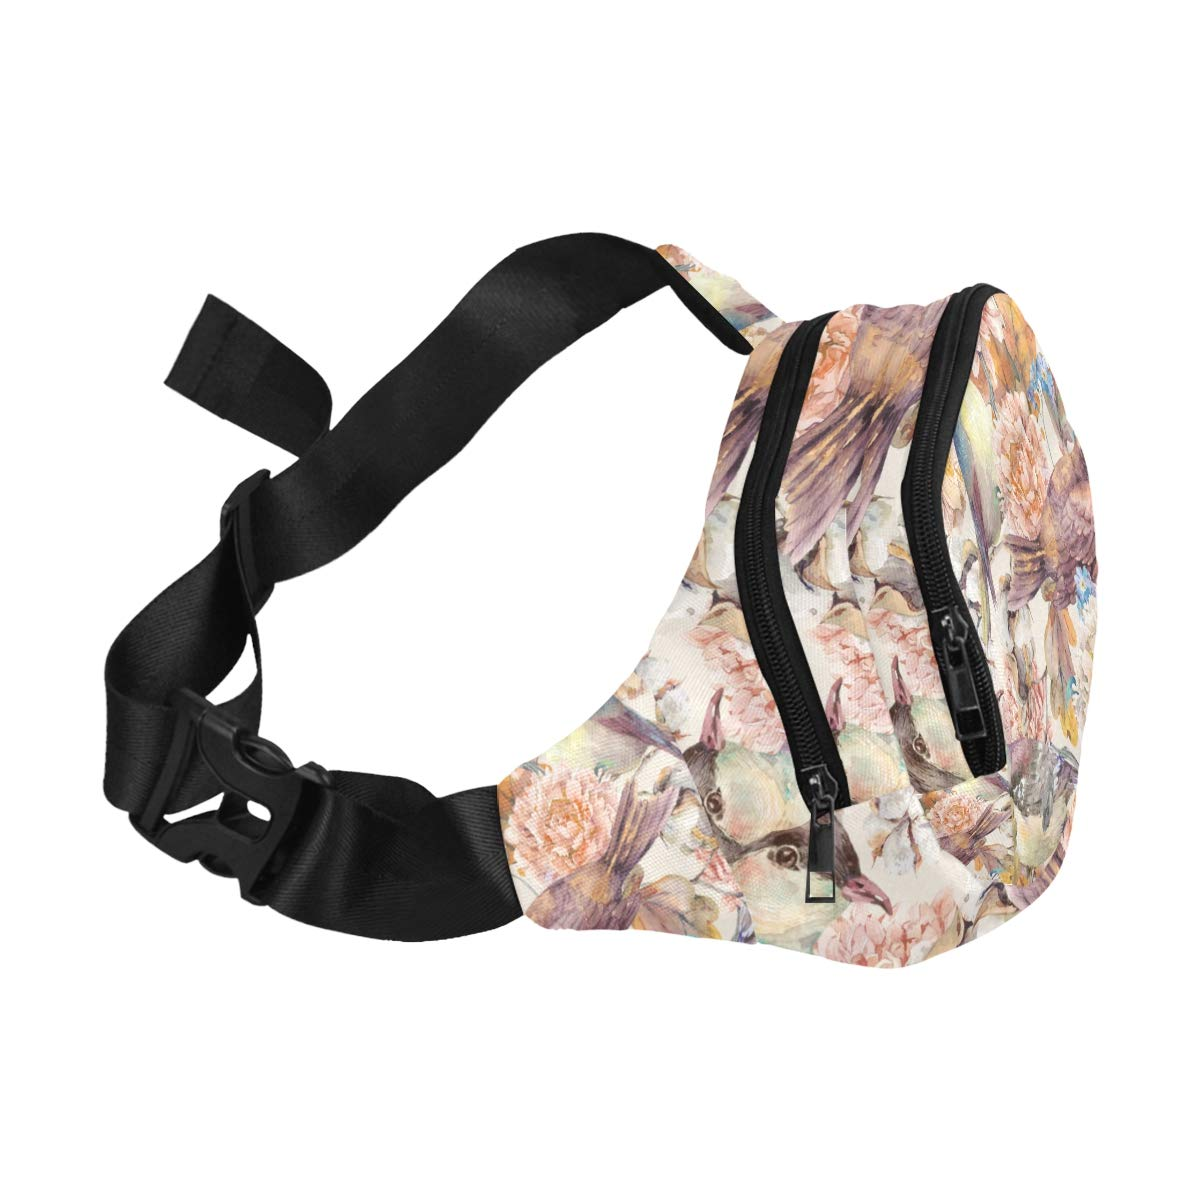 Colorful Chrysanthemum Watercolor Fenny Packs Waist Bags Adjustable Belt Waterproof Nylon Travel Running Sport Vacation Party For Men Women Boys Girls Kids